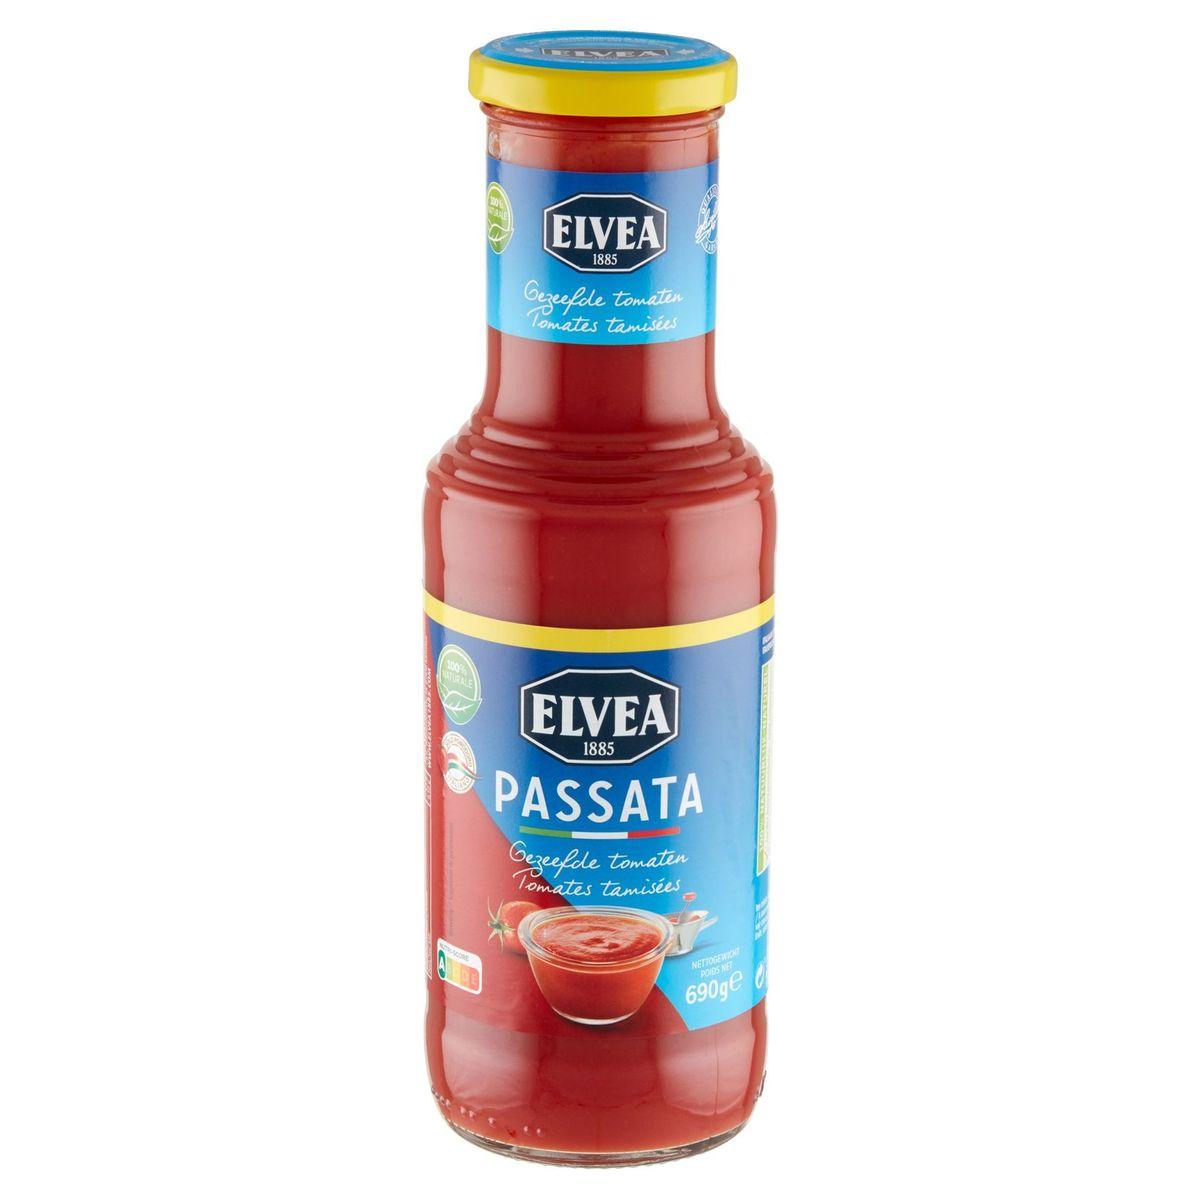 Elvea Passata Tomates Tamisées 690 g